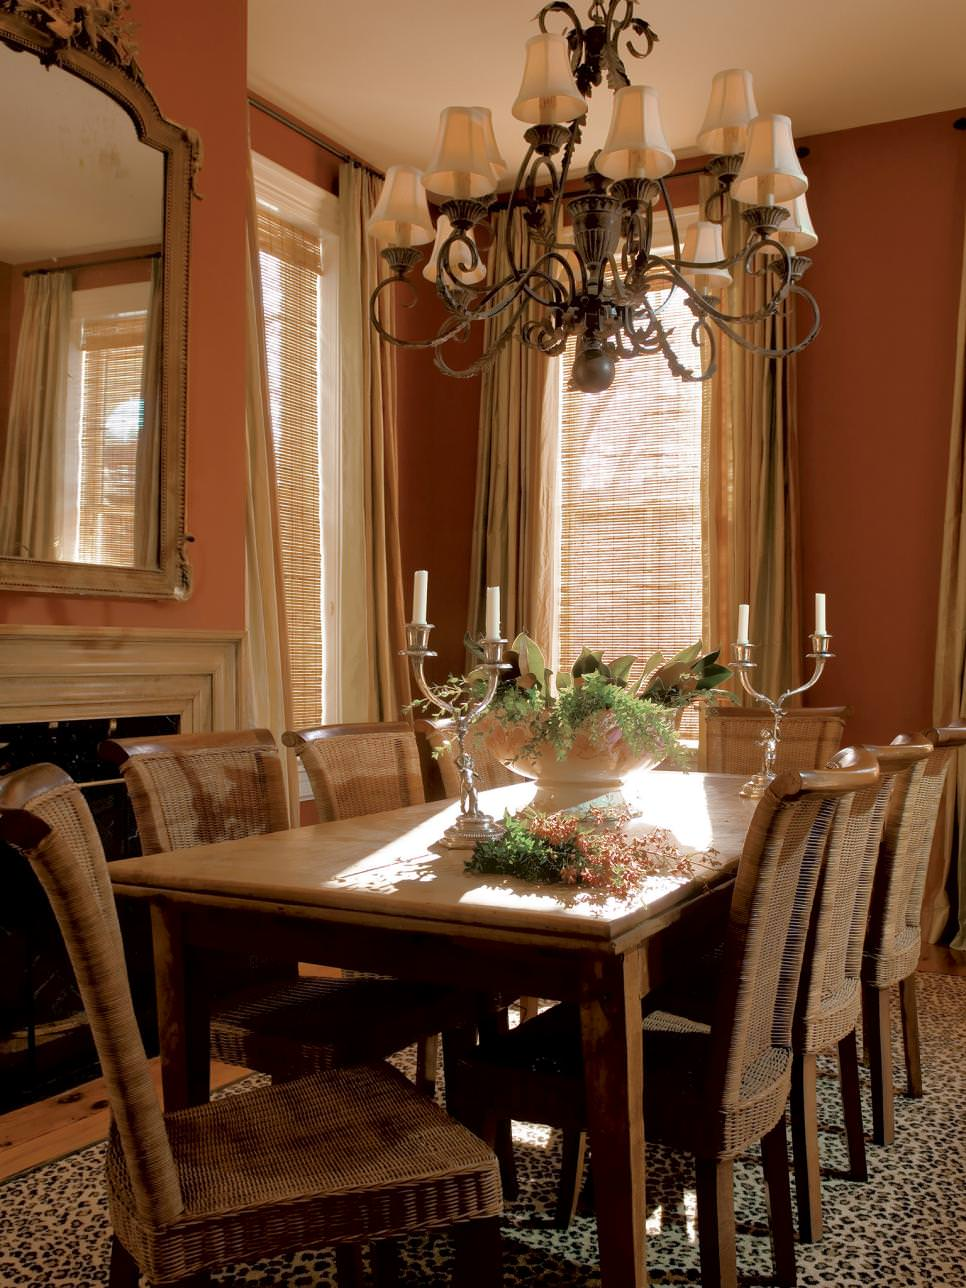 23 Dining Room Chandelier Designs Decorating Ideas Design Trends Premium PSD Vector Downloads